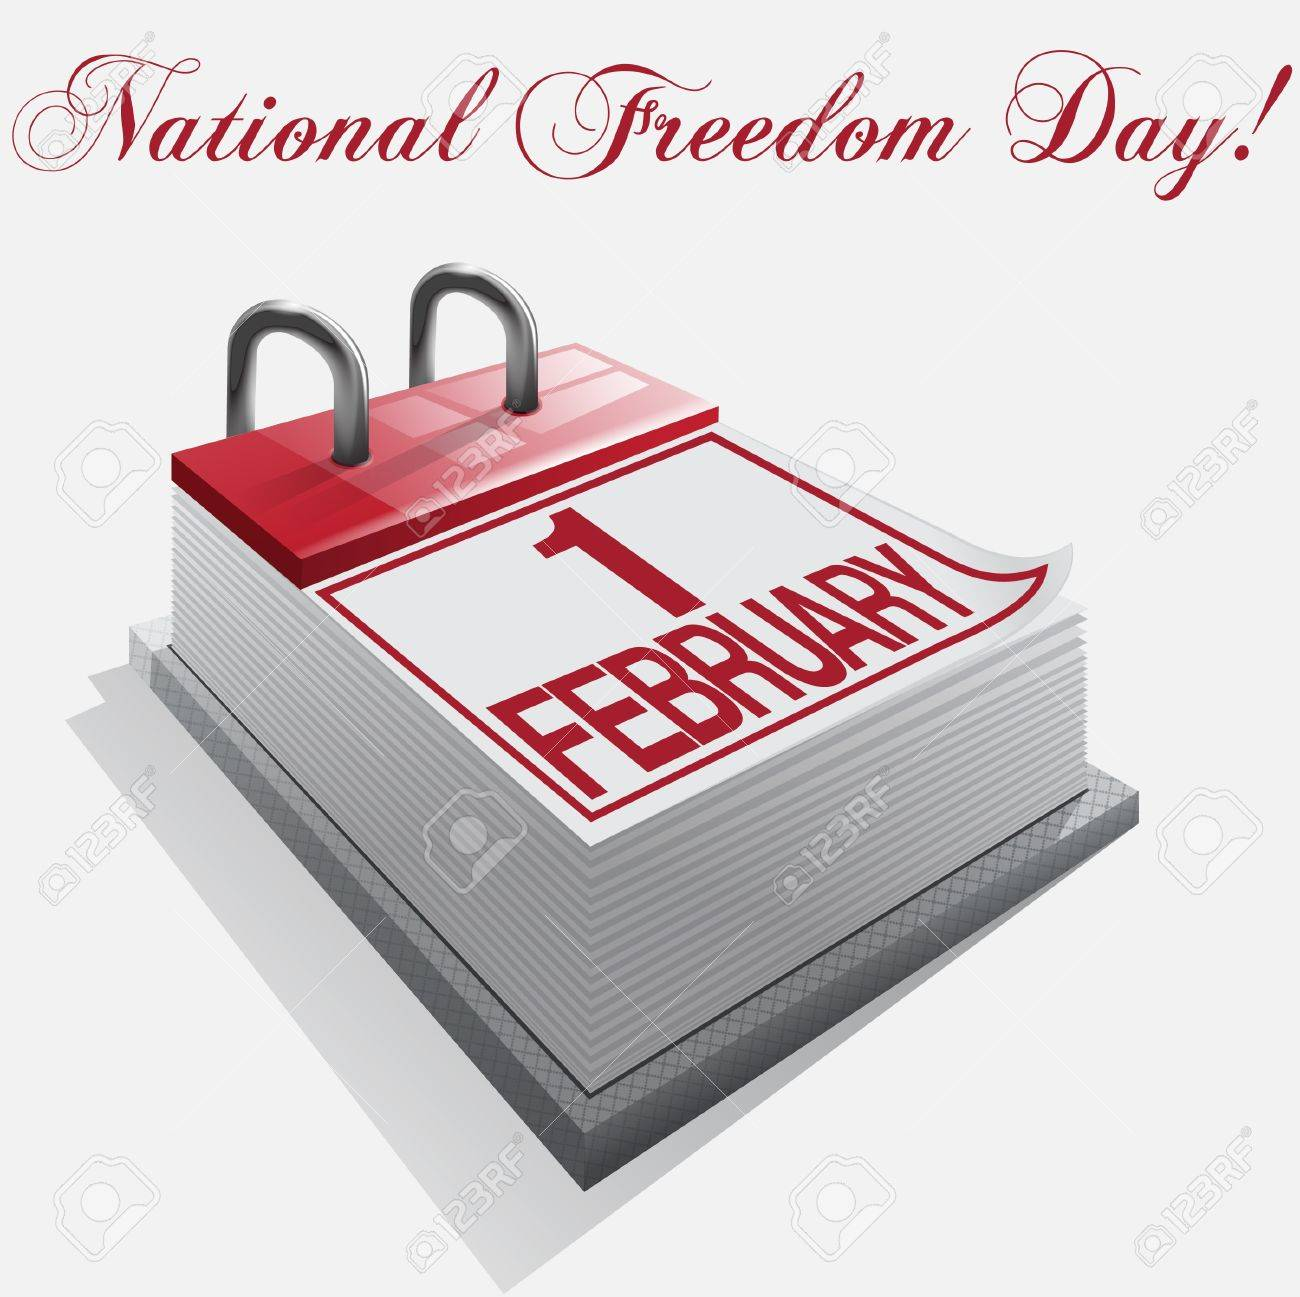 calendar 1 february National Freedom Day Stock Vector - 16921655